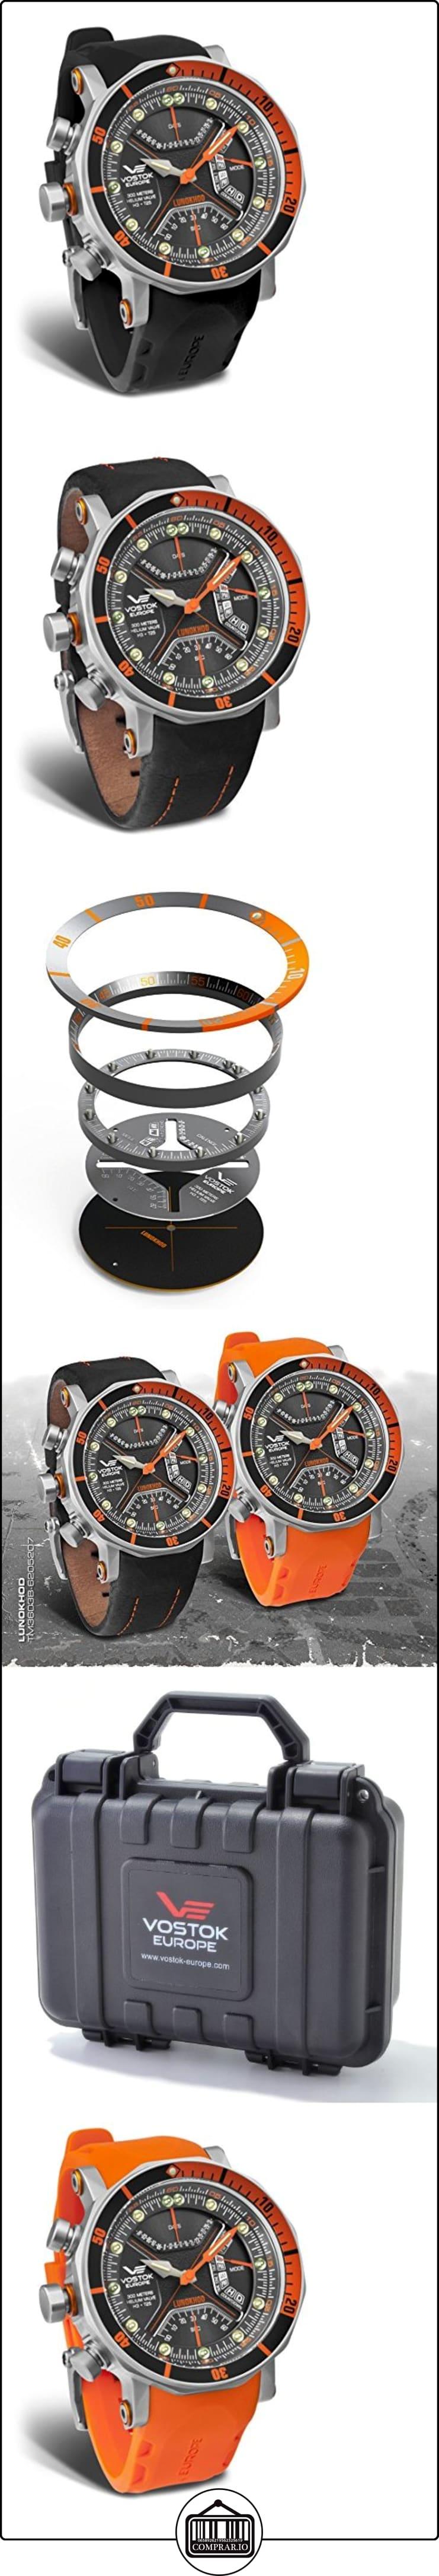 vostok-europe-Lunokhod 2-Cronógrafo Multifunción Buceo-Naranja Accents-tm3603/6205207  ✿ Relojes para hombre - (Lujo) ✿